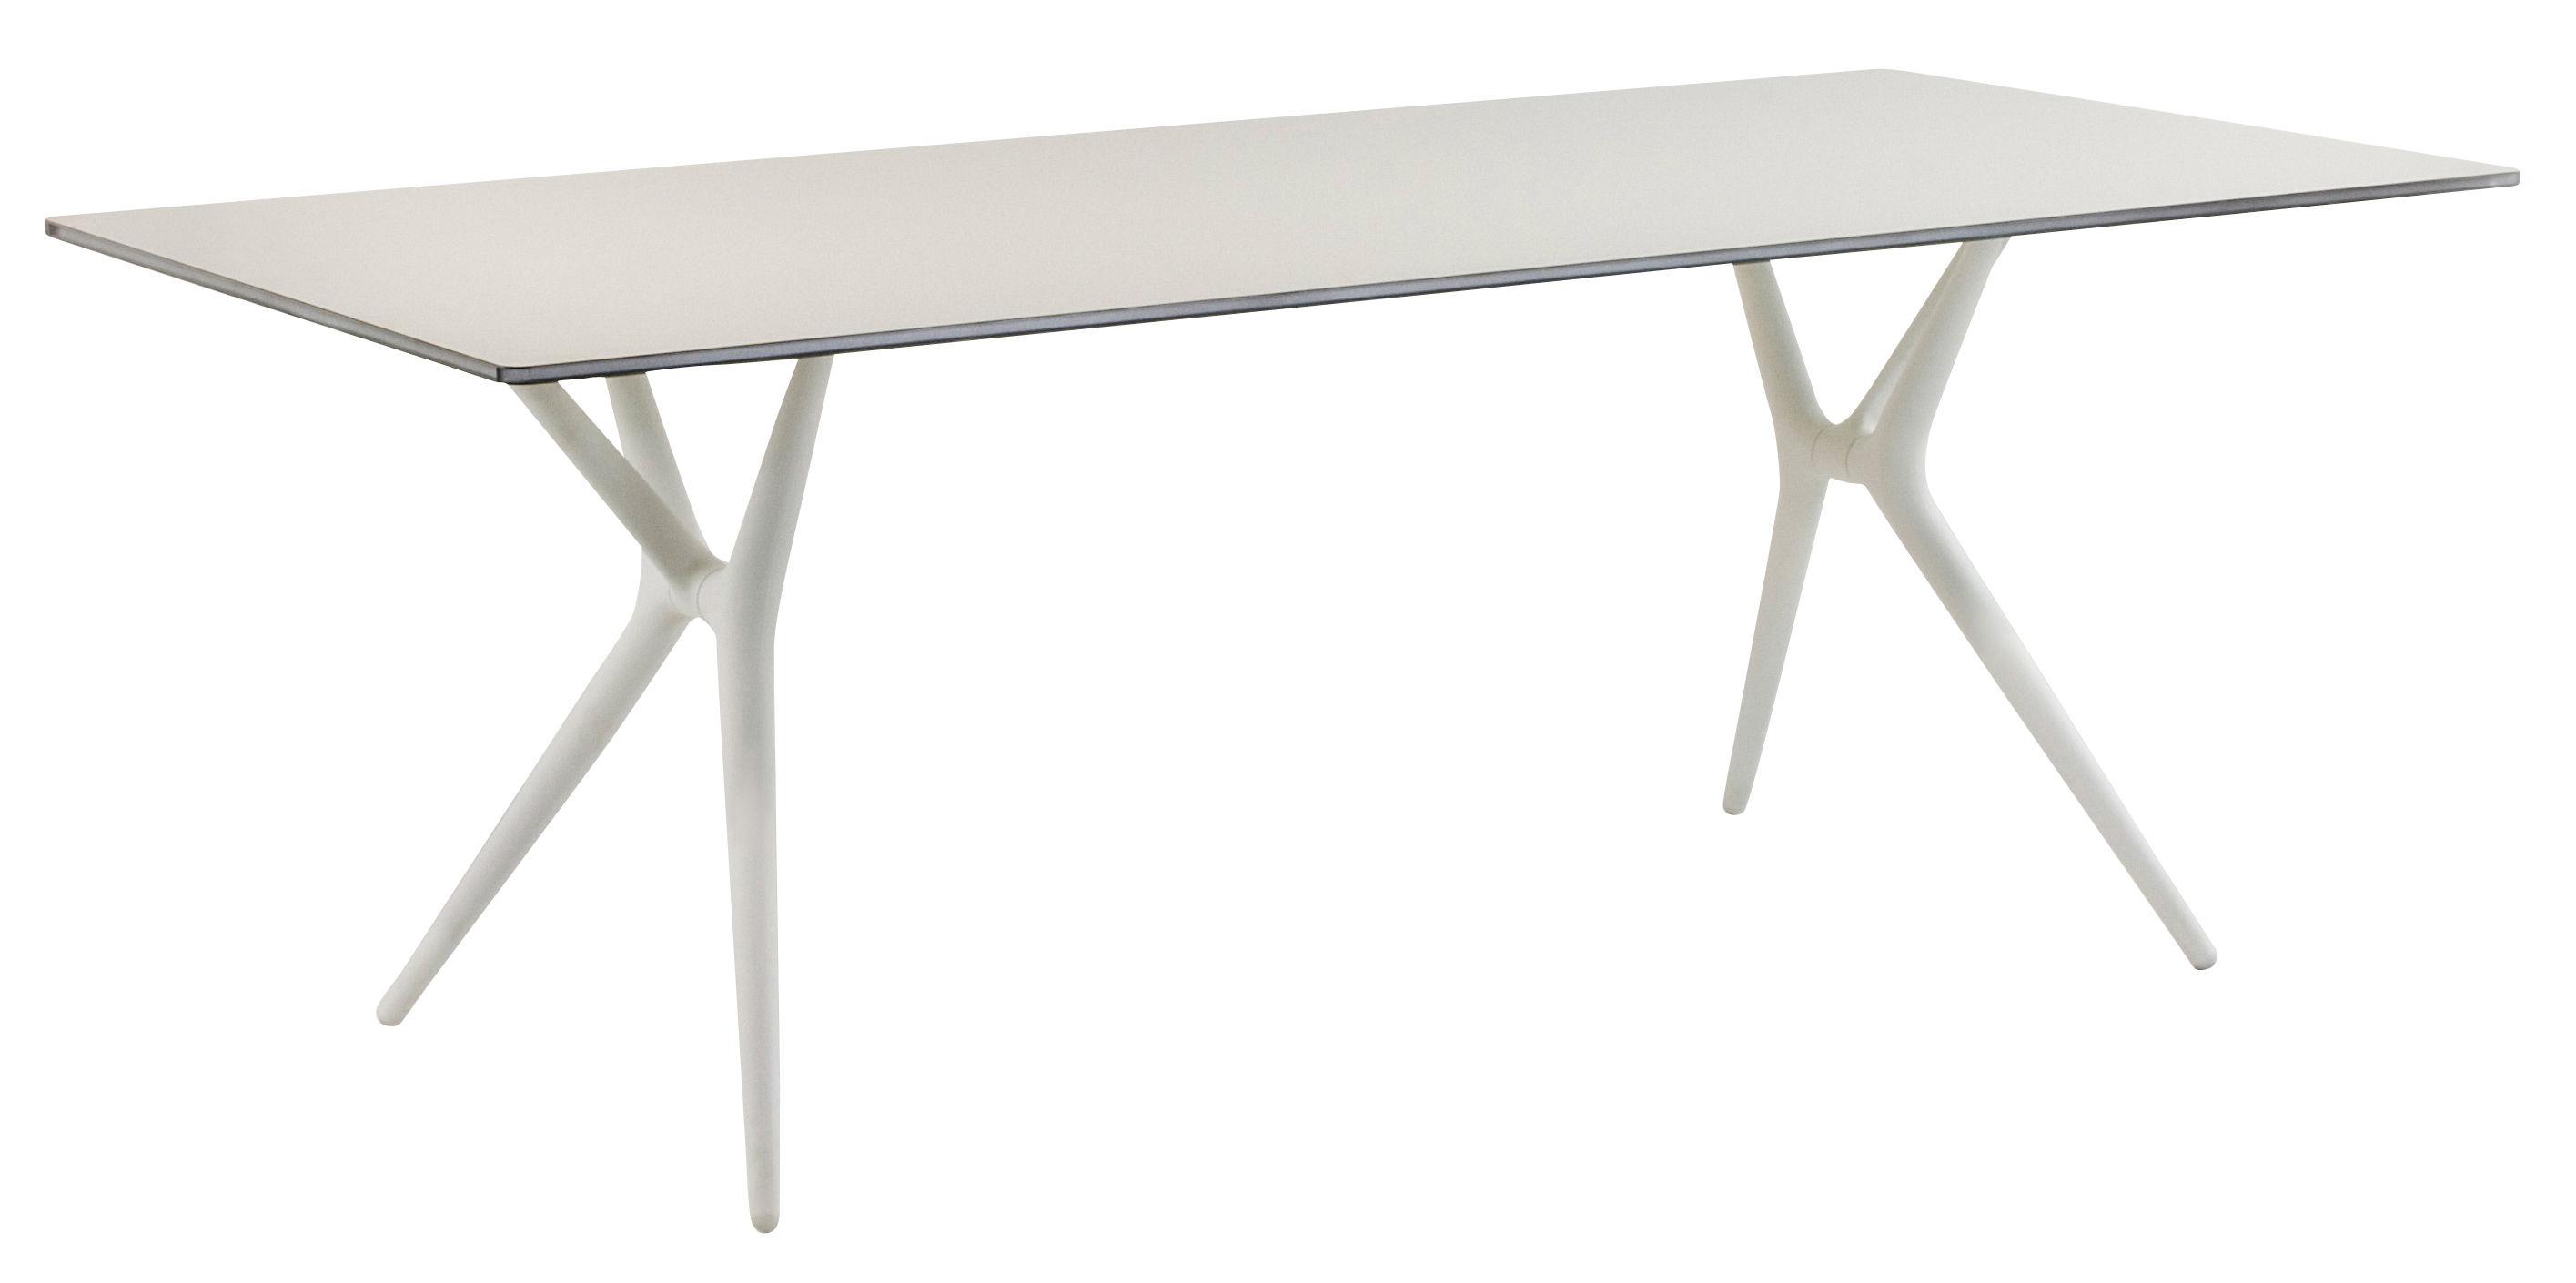 table pliante spoon bureau 140 x 70 cm plateau blanc pieds blancs kartell. Black Bedroom Furniture Sets. Home Design Ideas